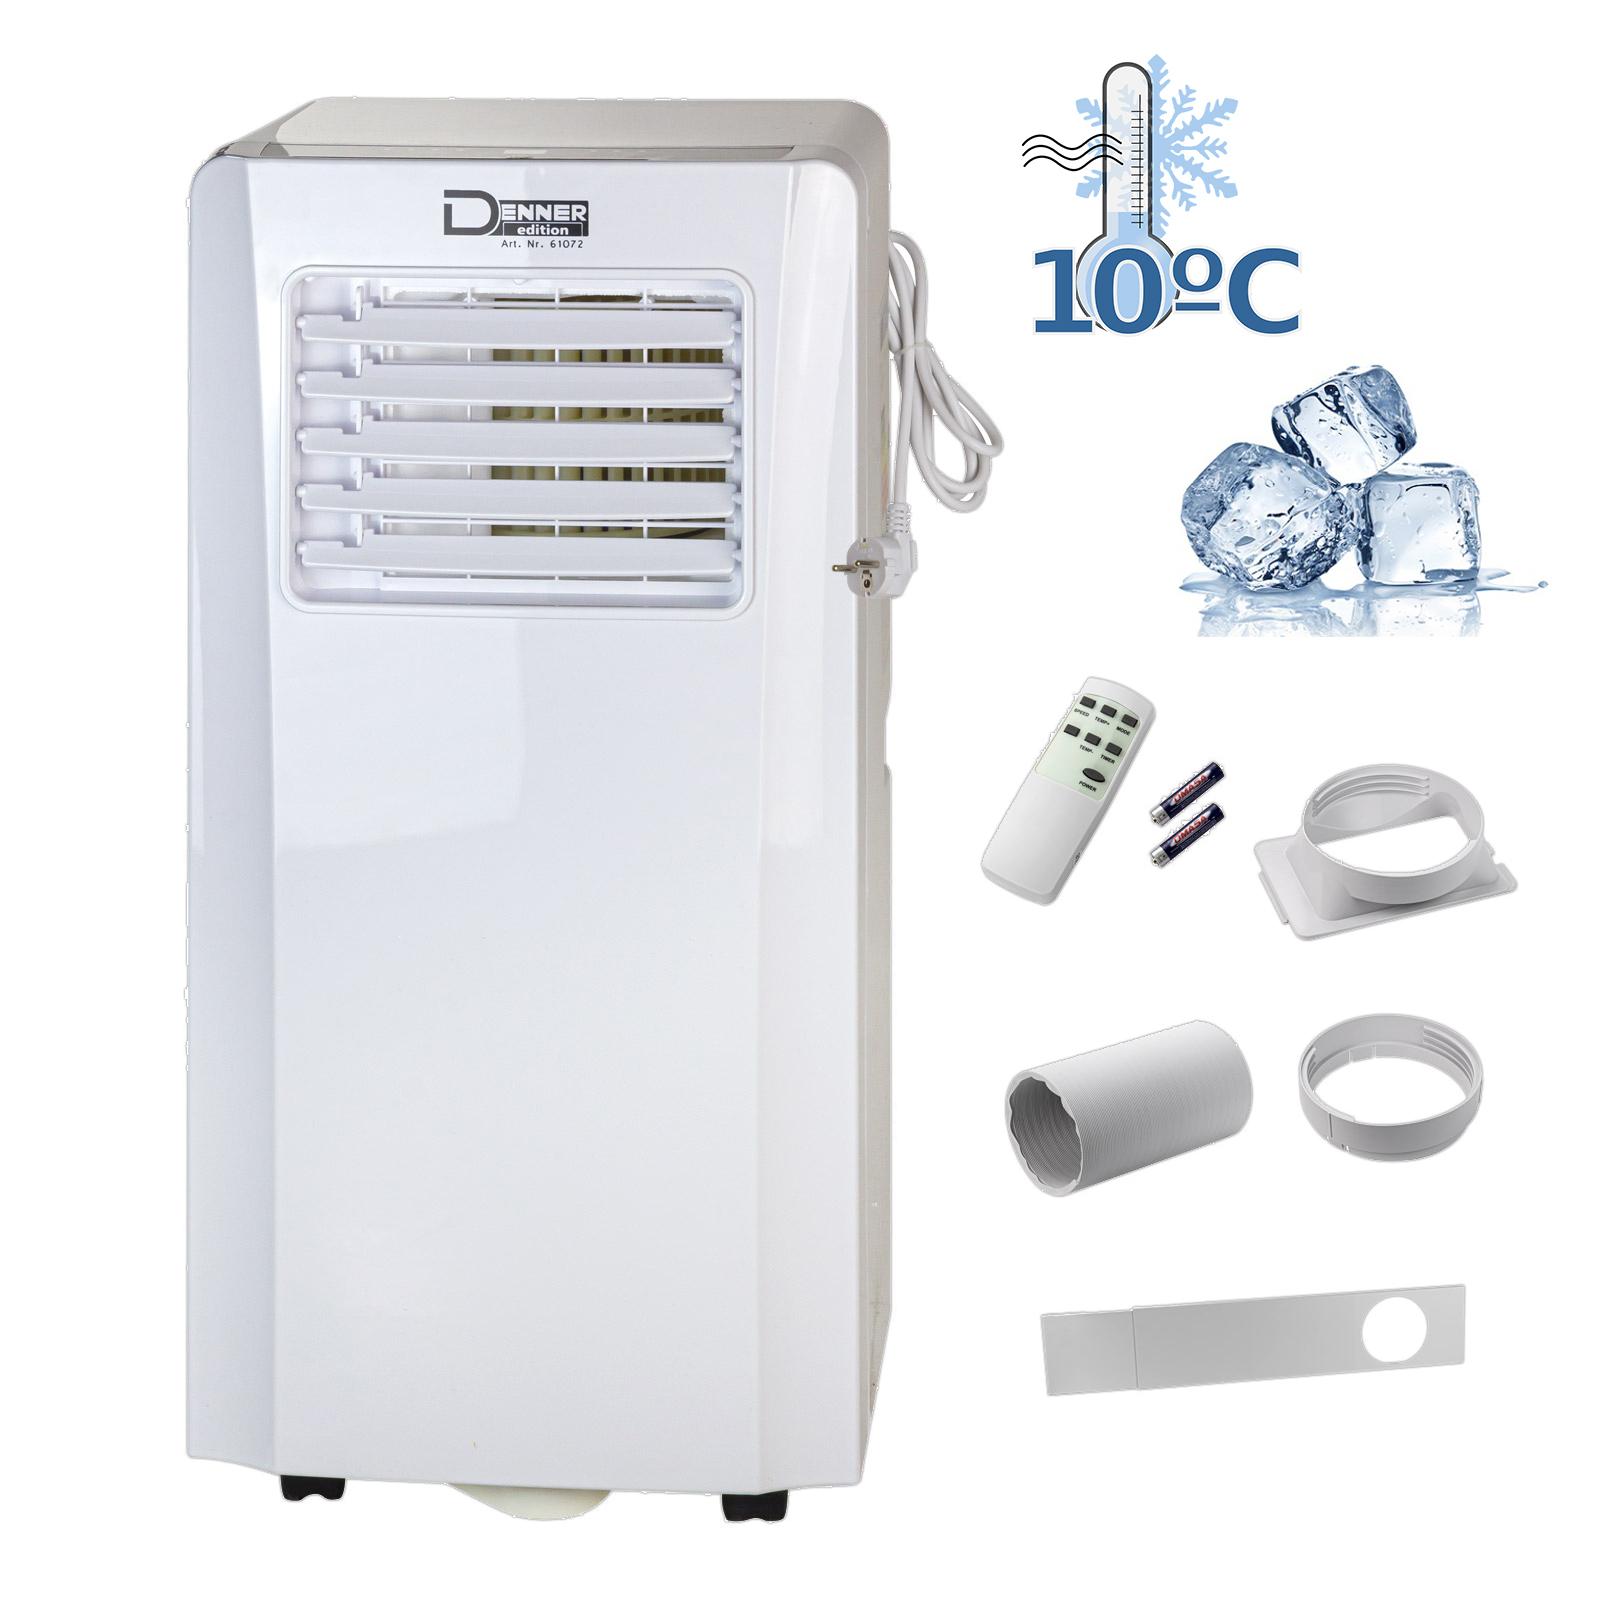 Denner-Edition Mobiles Klimagerät DMK 9000 Luftkühler Ventilator Klimaanlage Ionisator 2,6 kW 61072